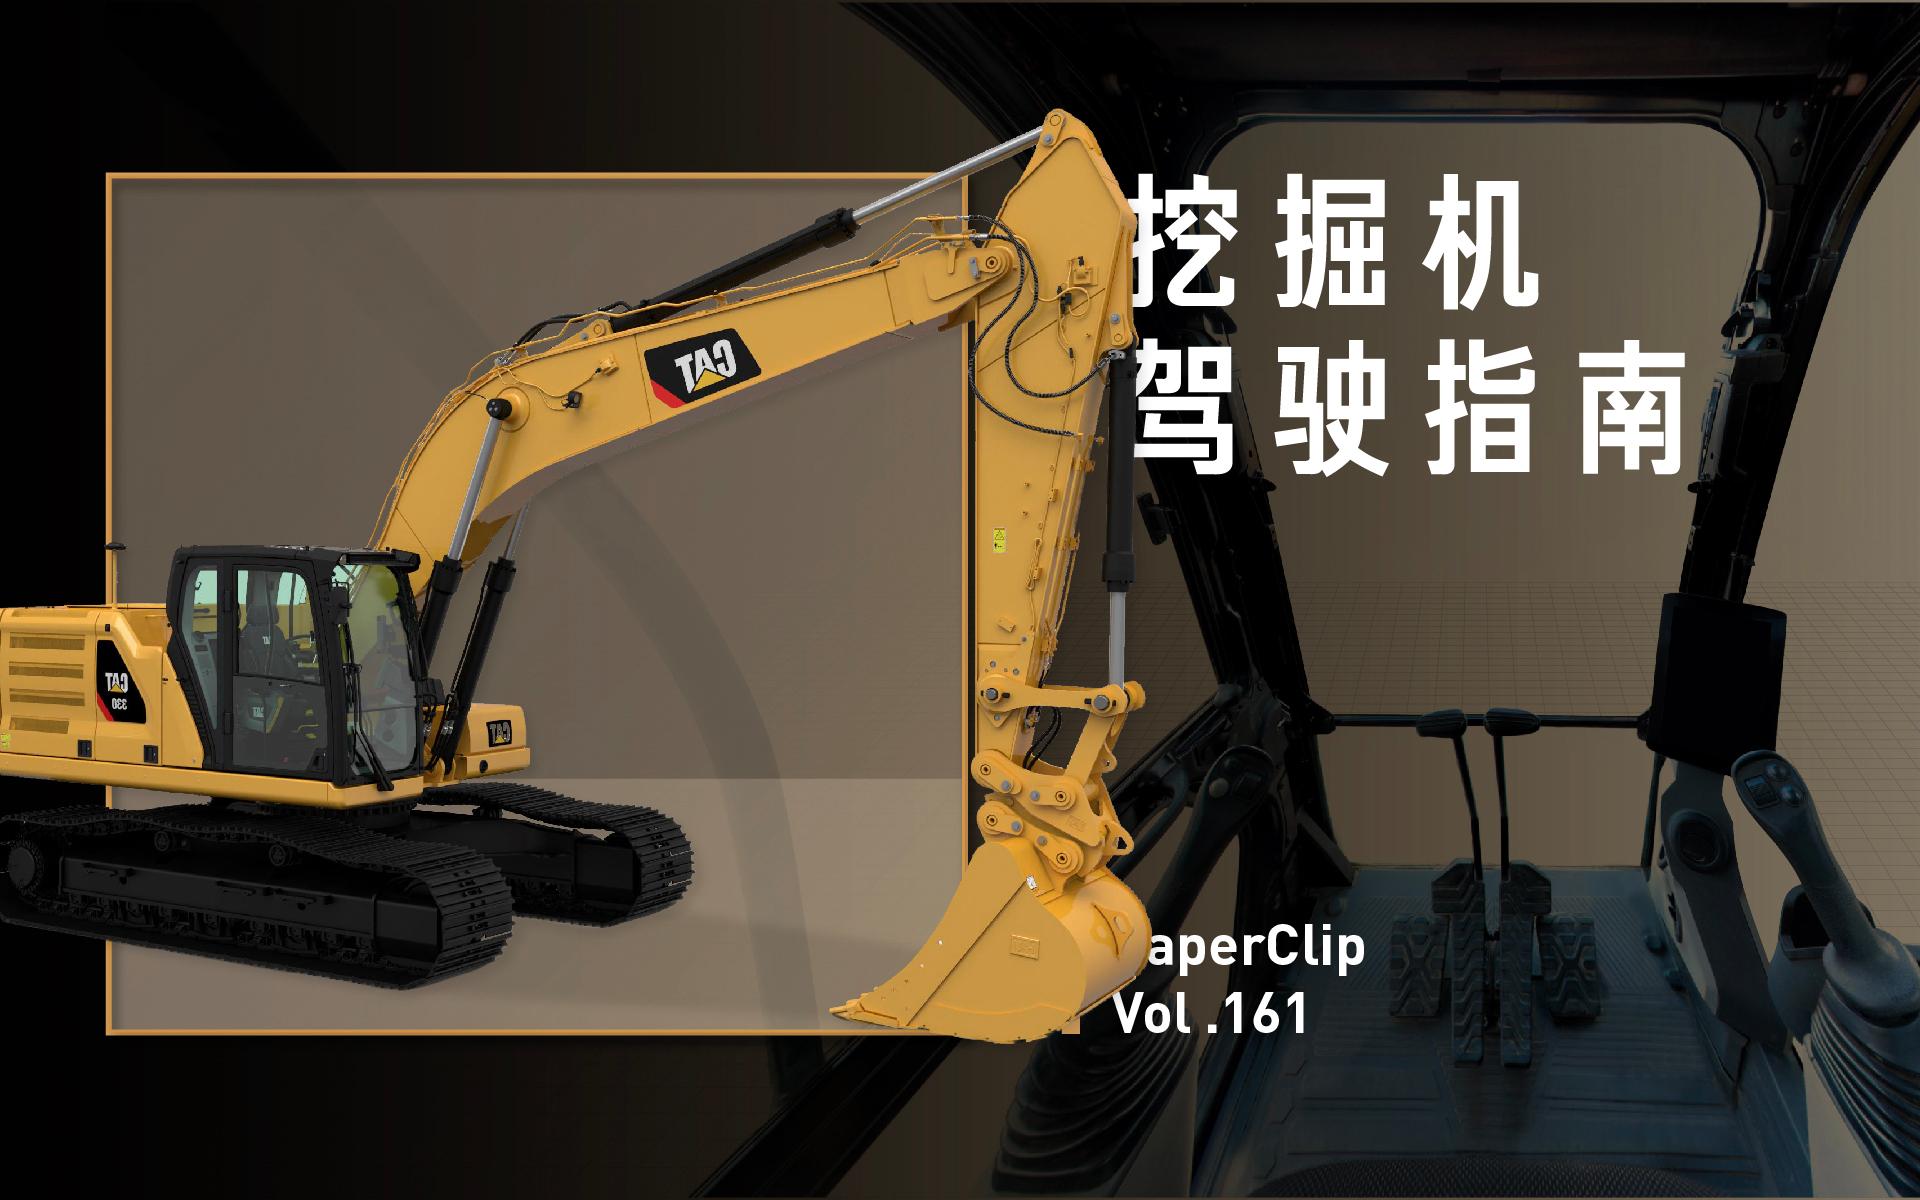 Vol.161 挖掘机驾驶指南